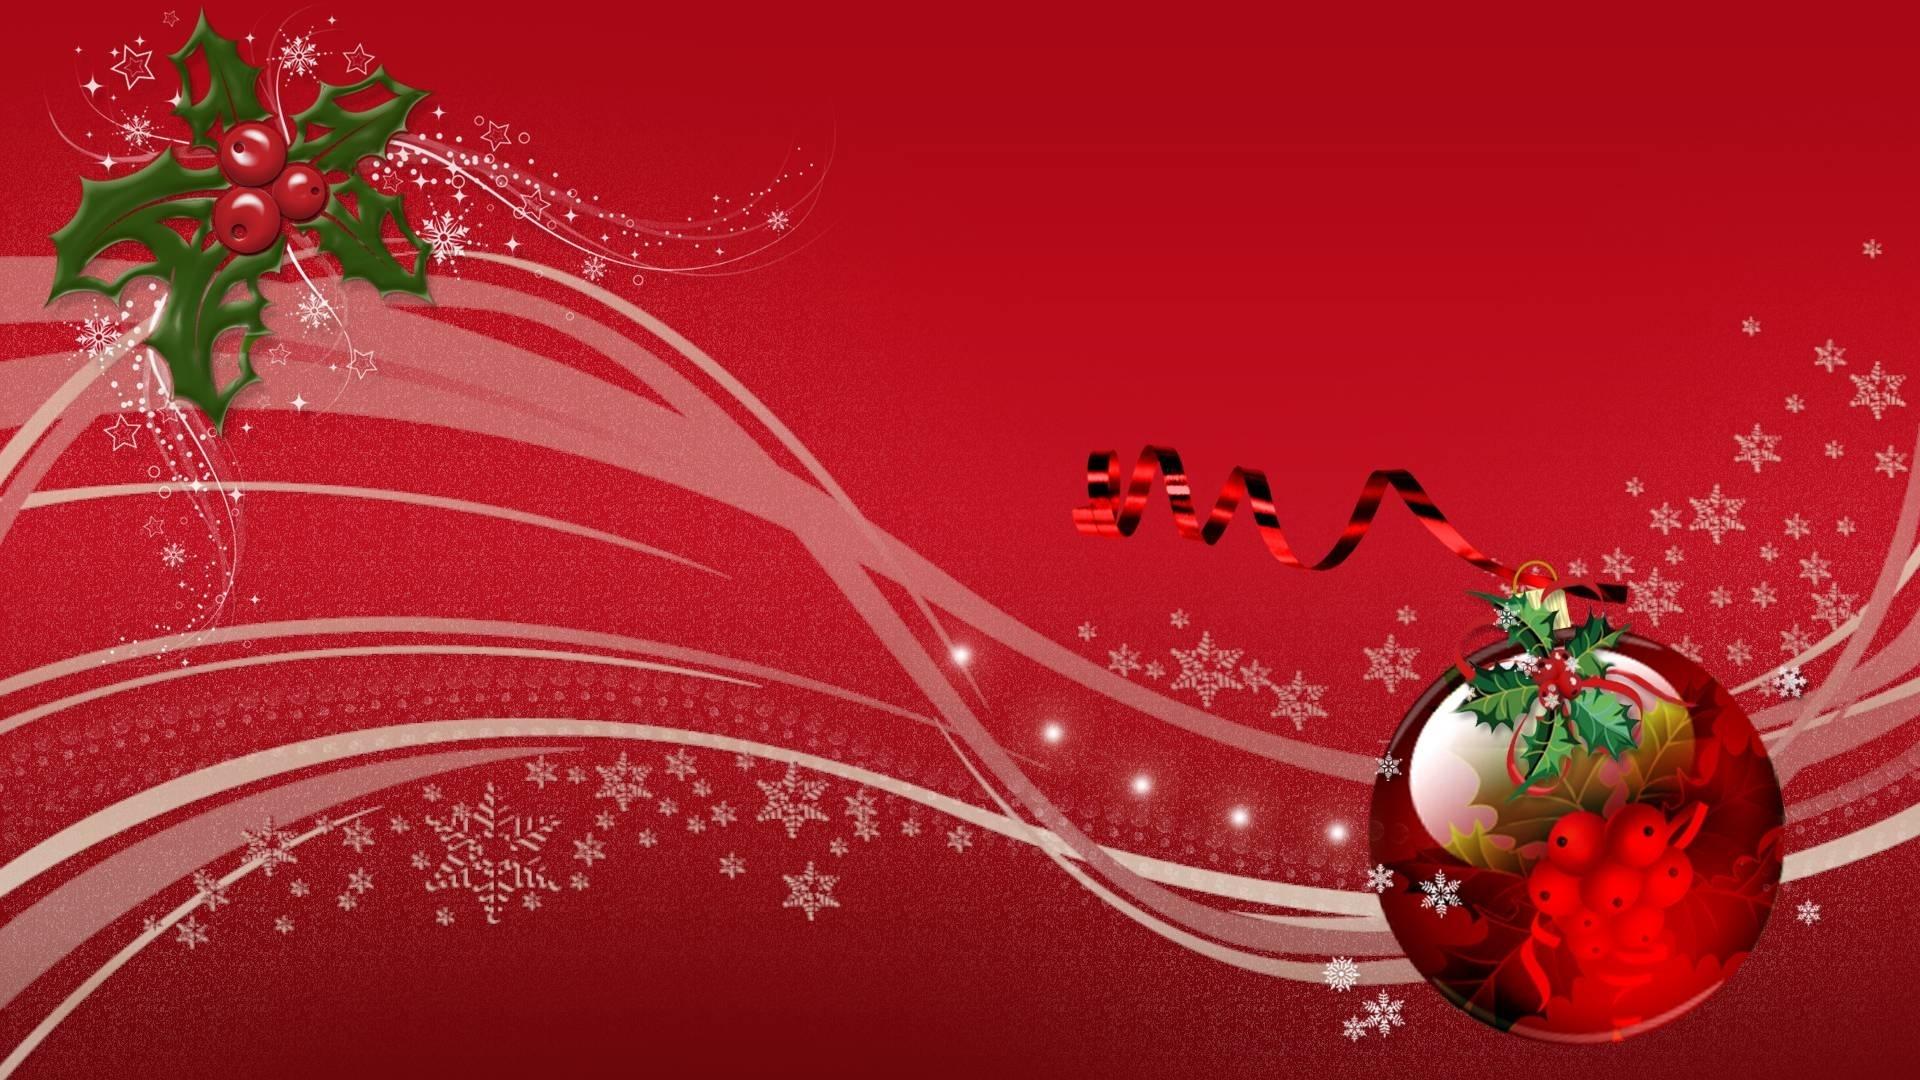 Christmas Red Wallpaper